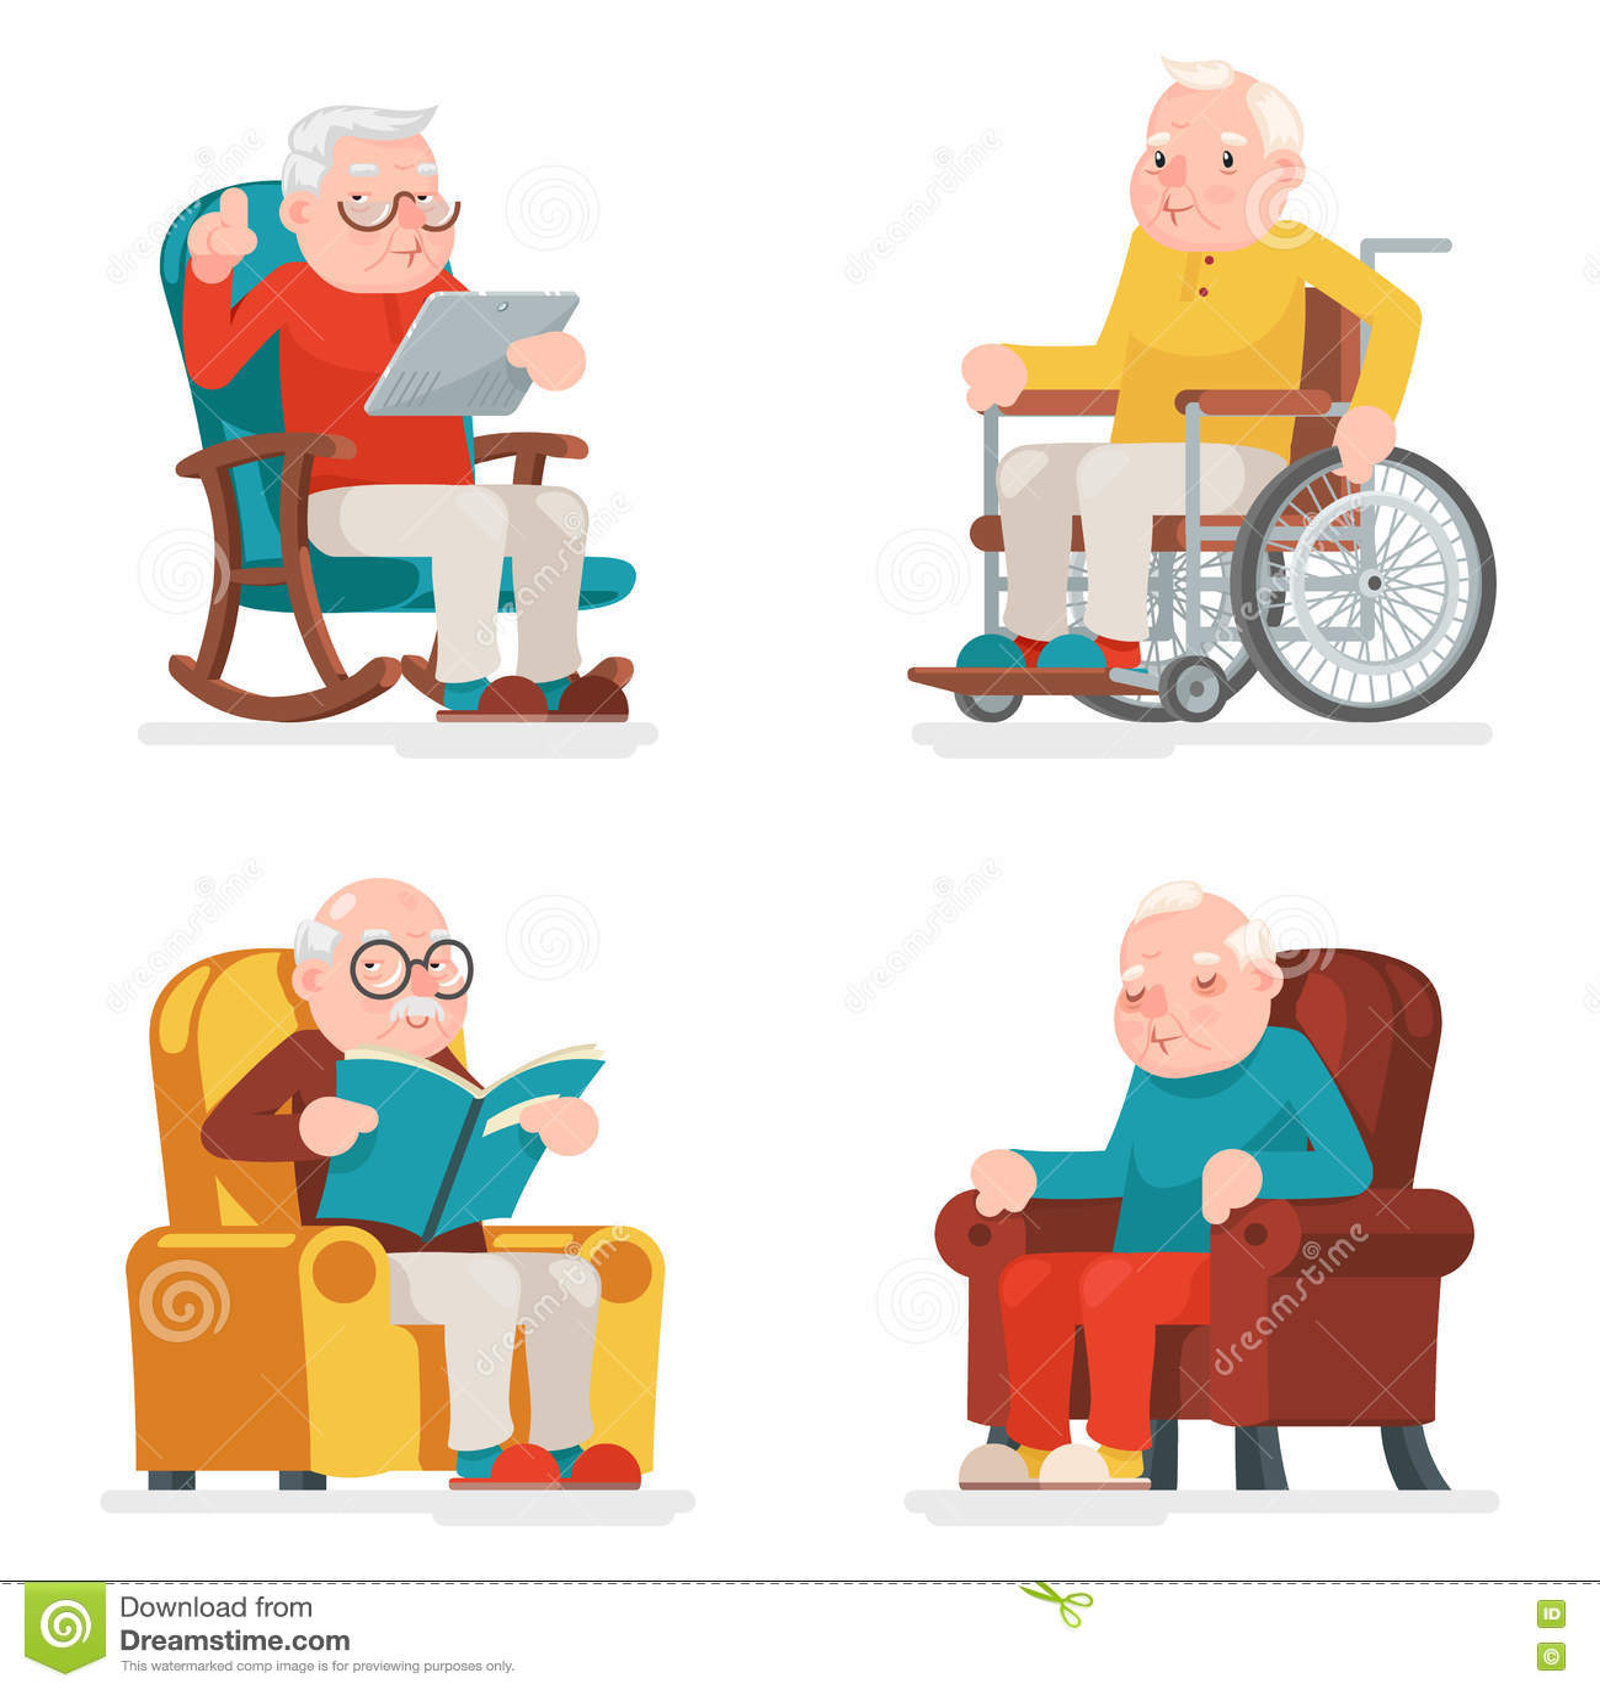 Alter Mann-Charakter-Sit Sleep Web Surfing Read-Lehnsessel-Rollstuhl-erwachsene Ikonen eingestellte Karikatur-Design-Vektor-Illus